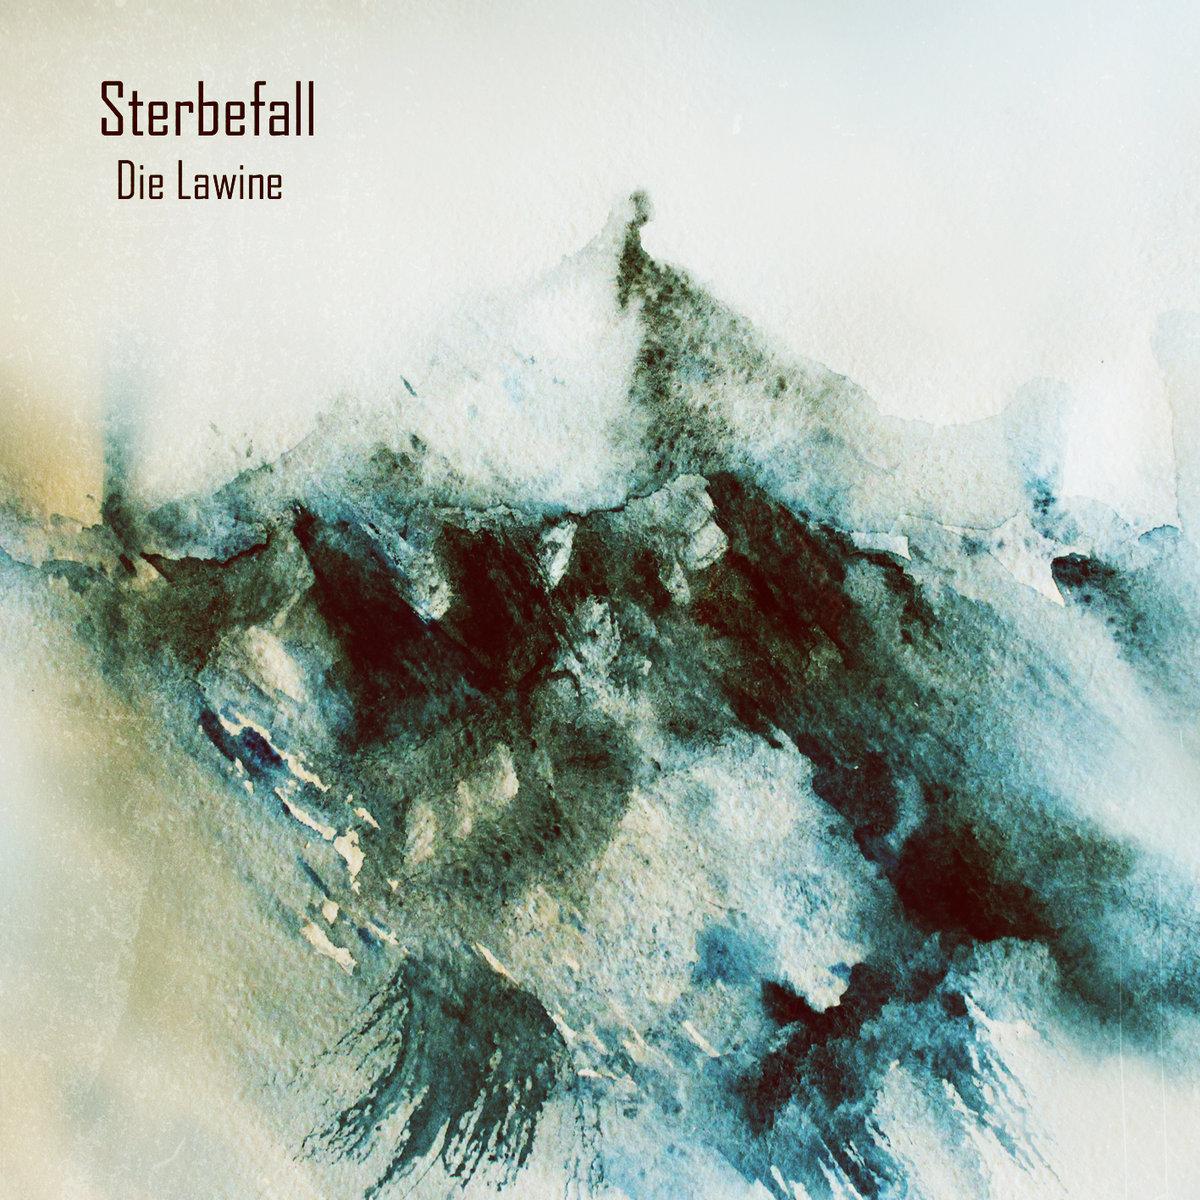 https://nihilart.bandcamp.com/album/sterbefall-die-lawine